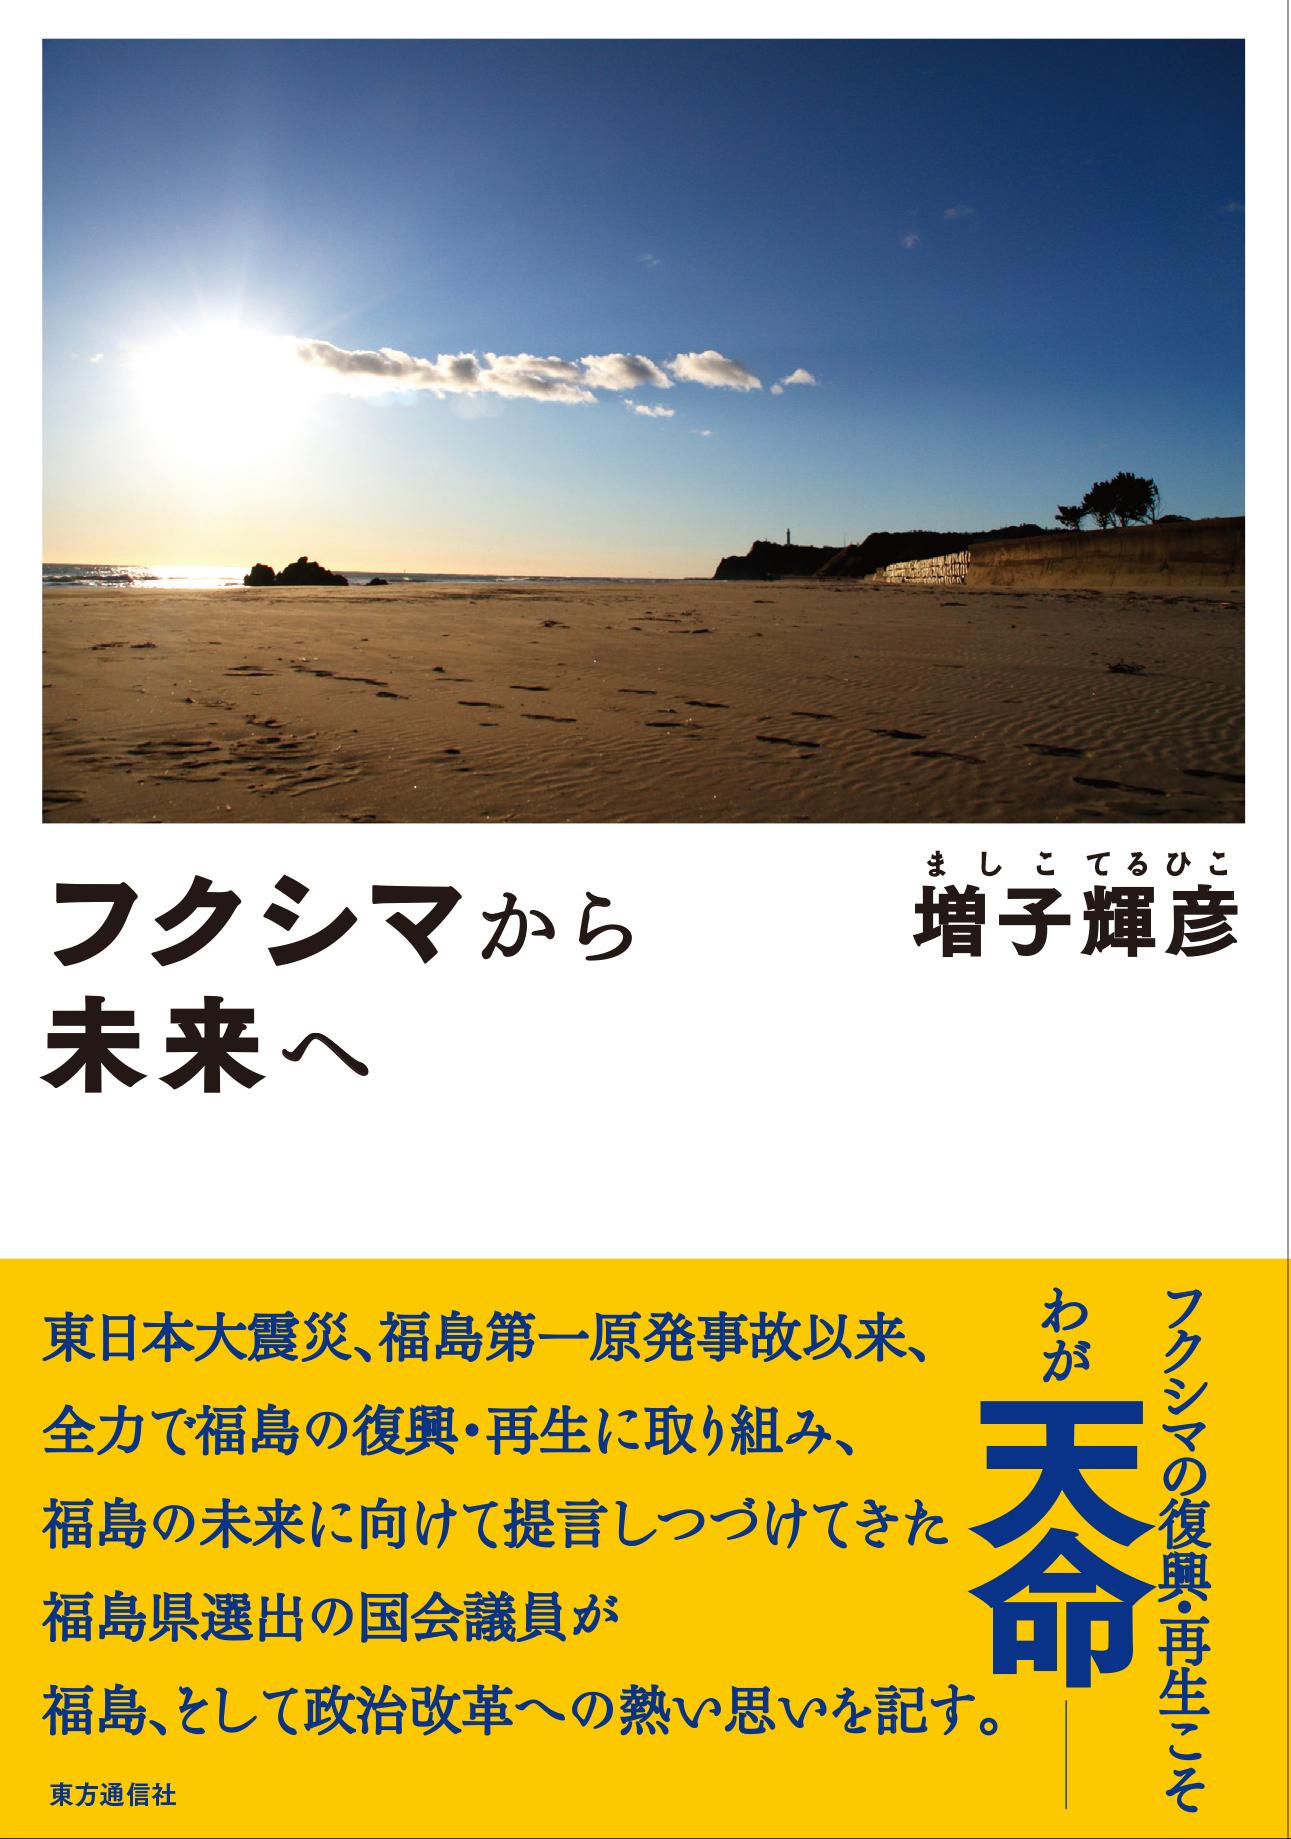 fukushimamirai_cover_presen_fin.indd